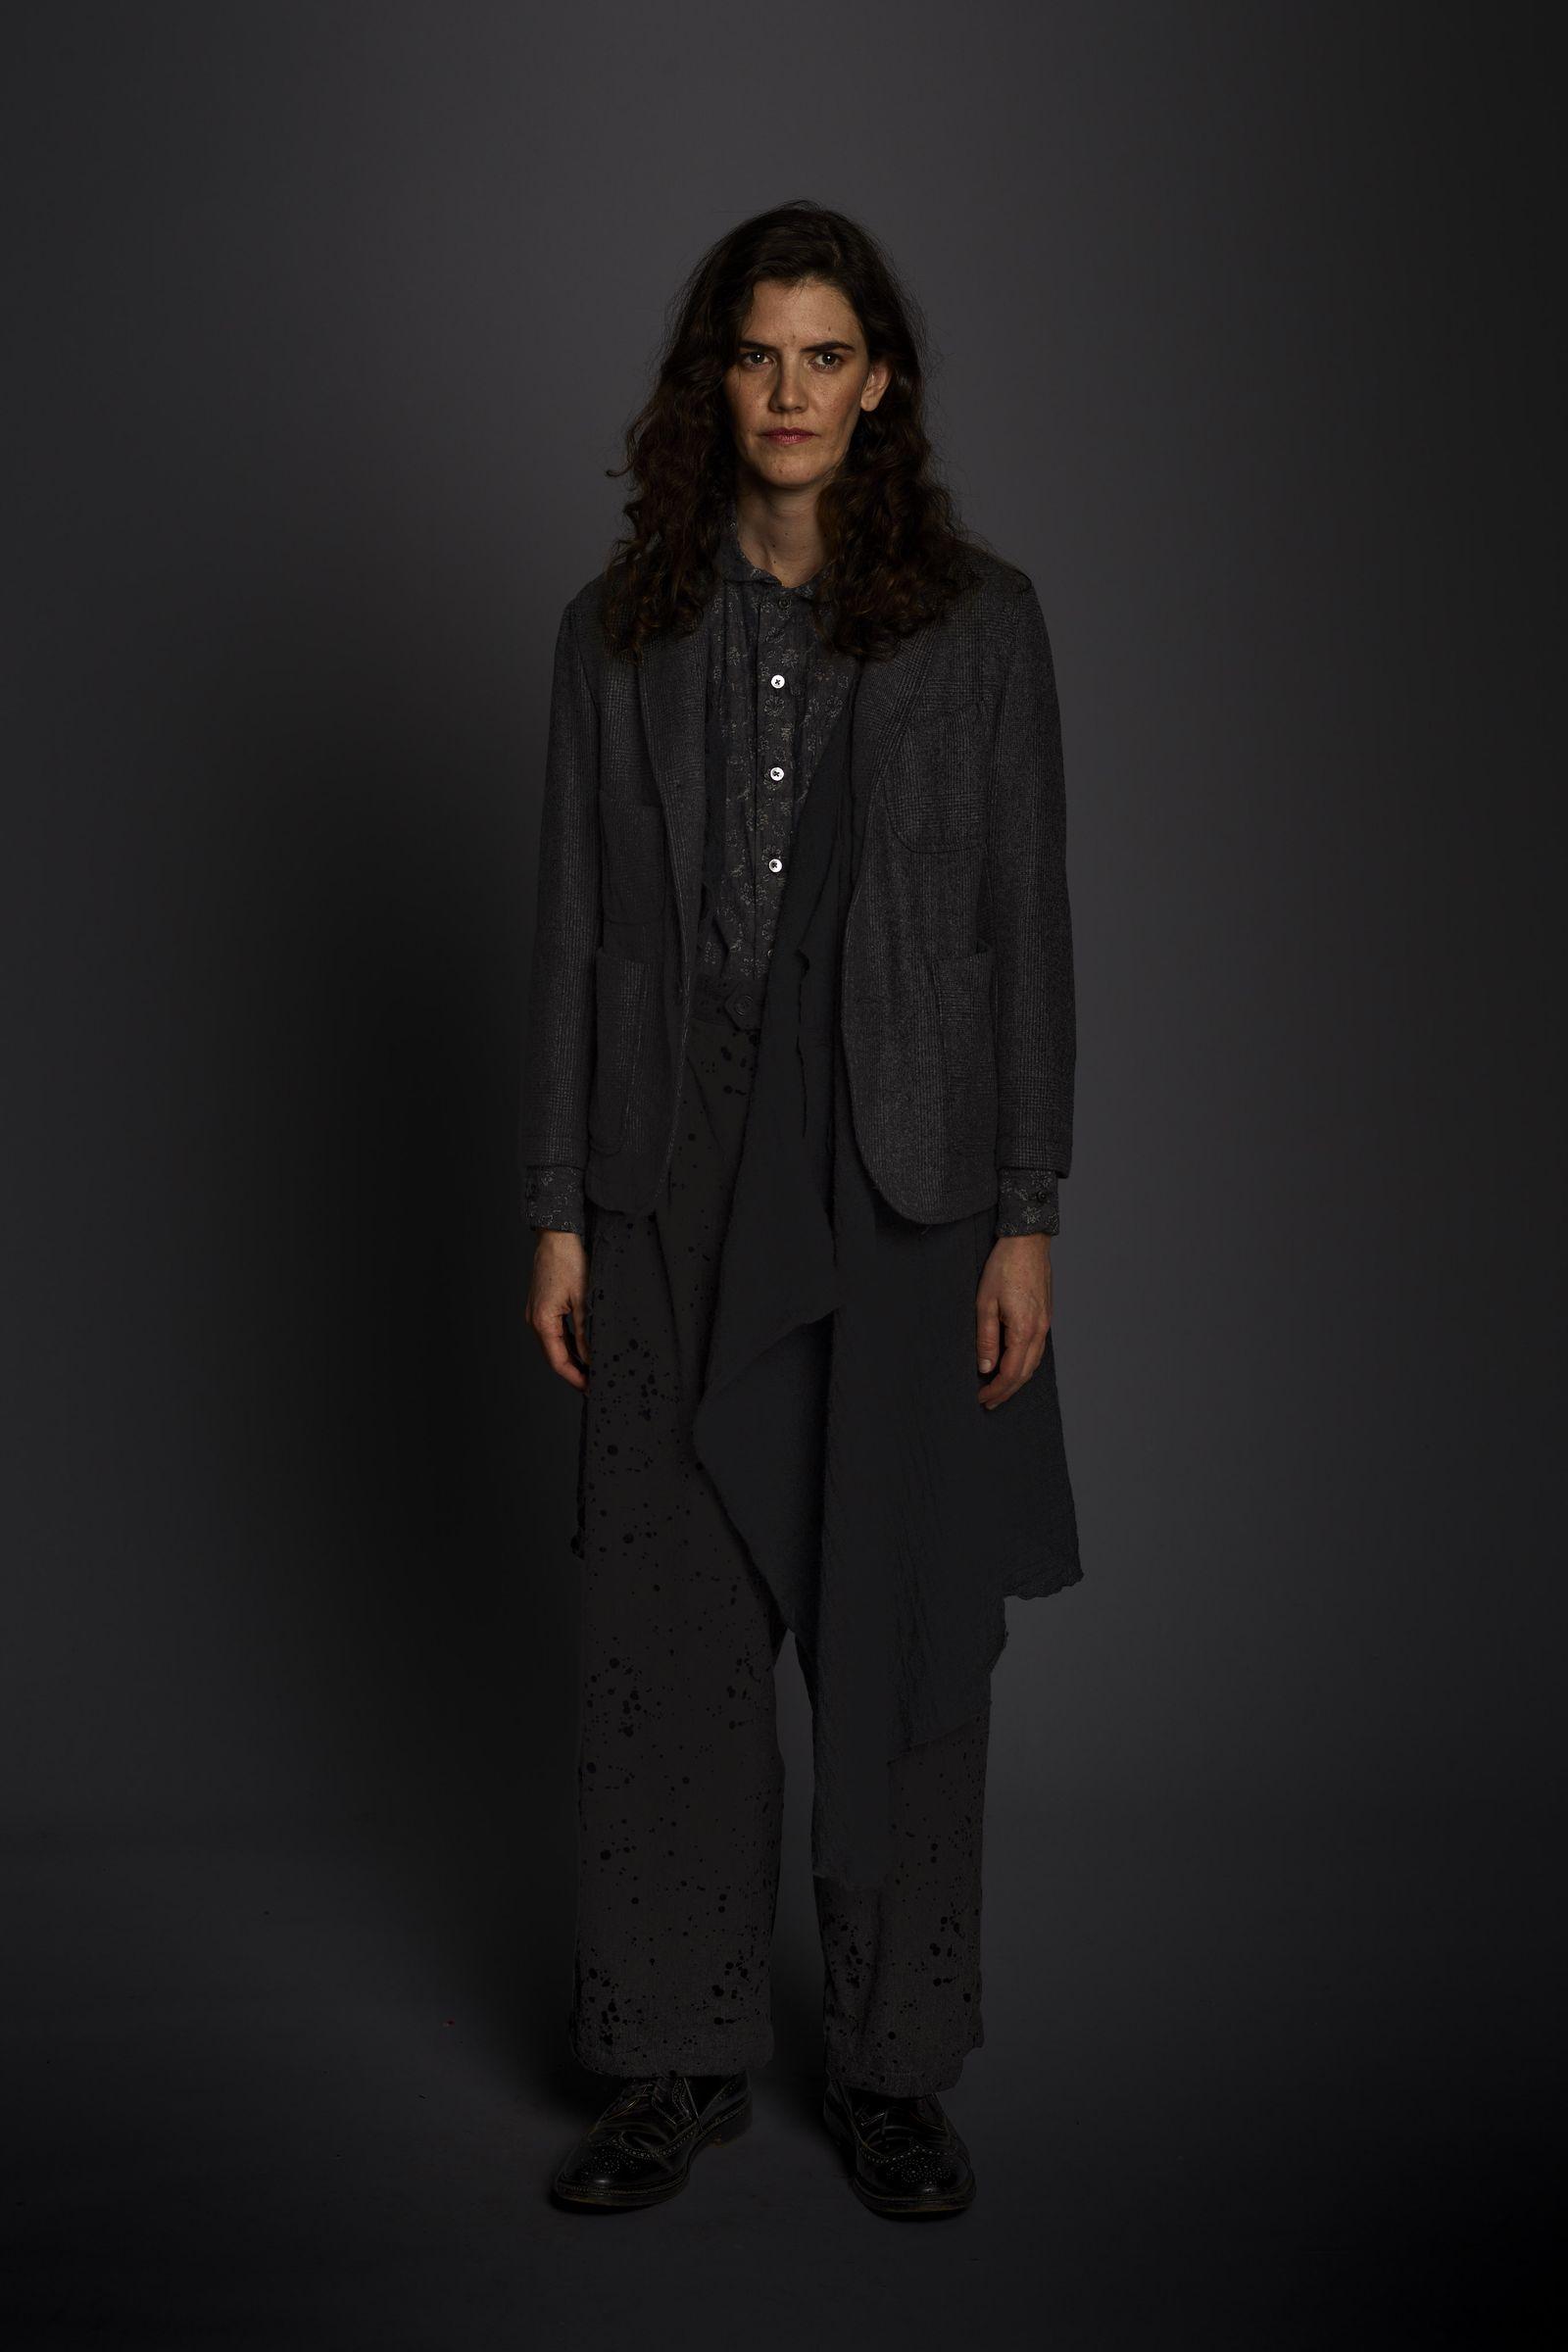 engineered-garments-fall-winter-2020-27